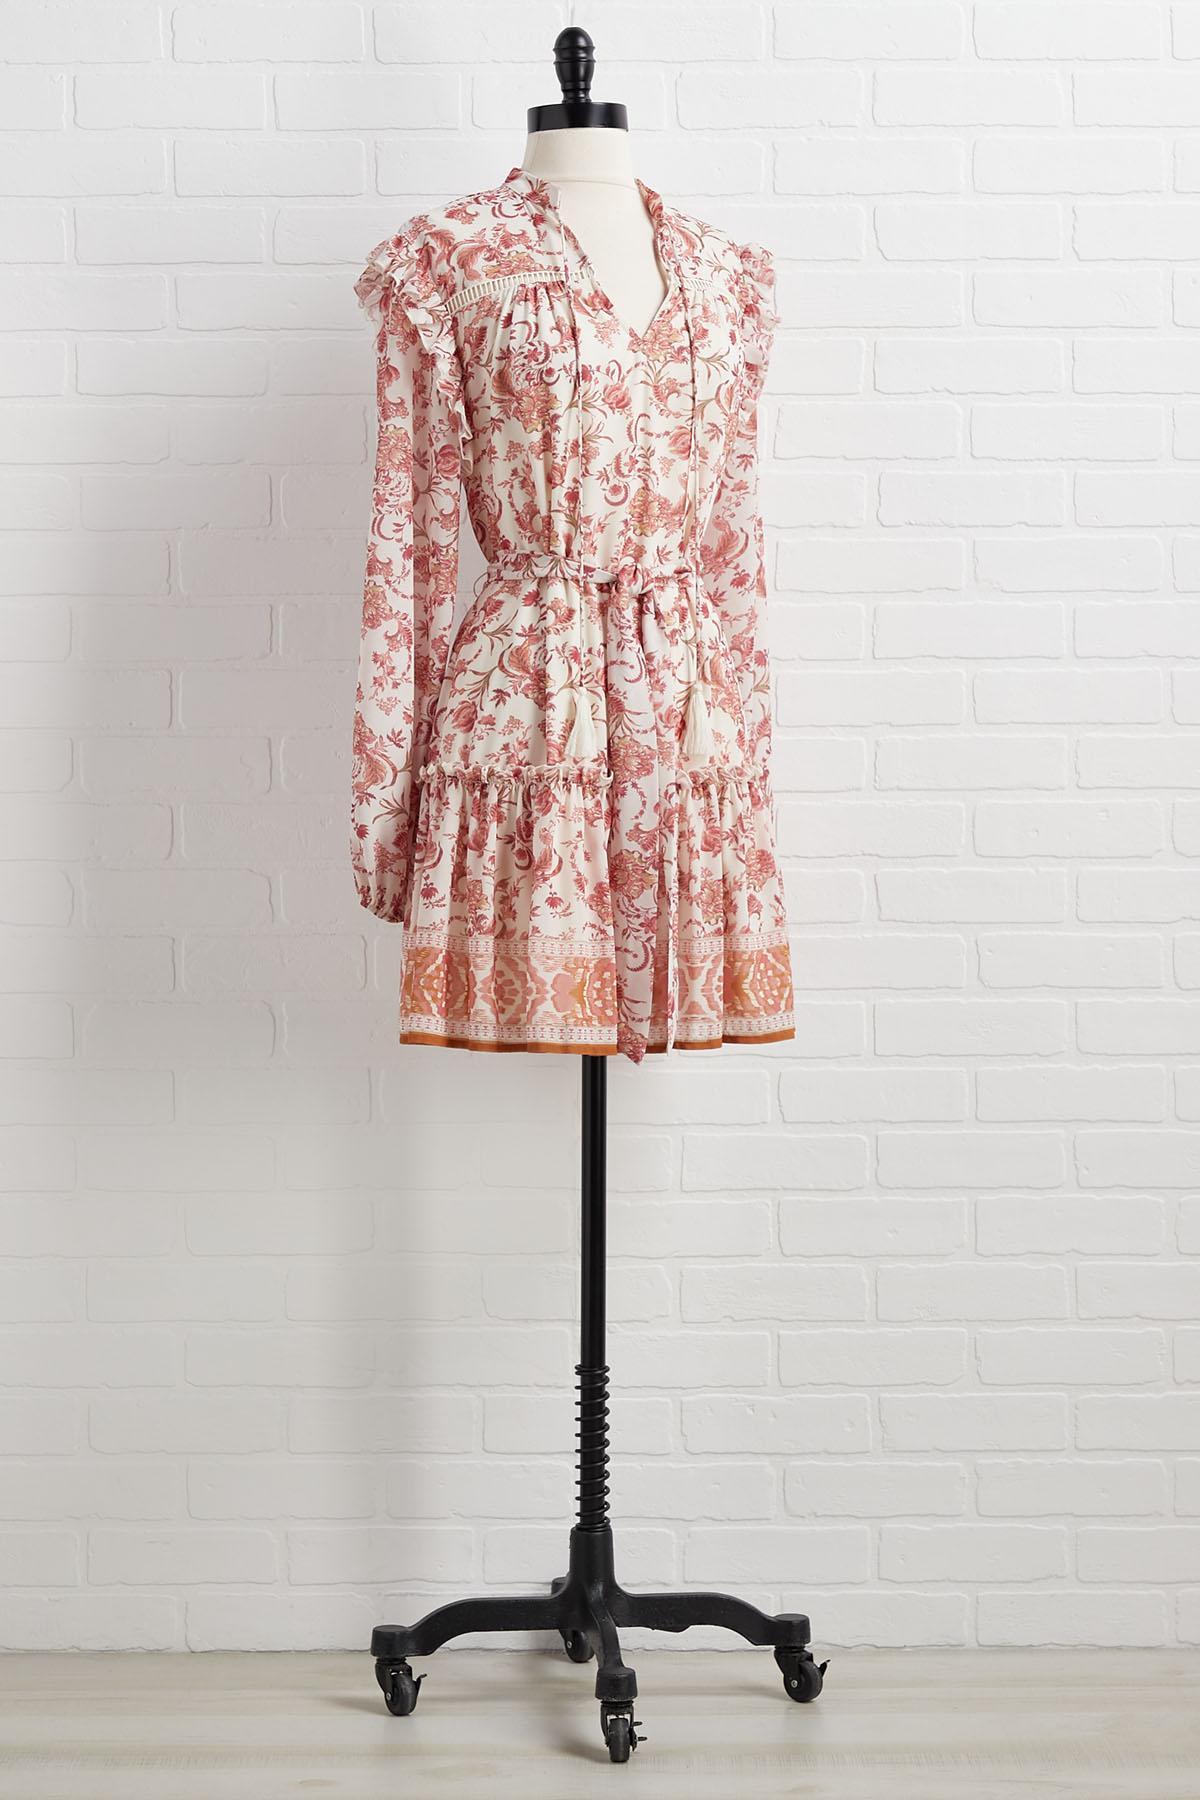 Use The Budding System Dress